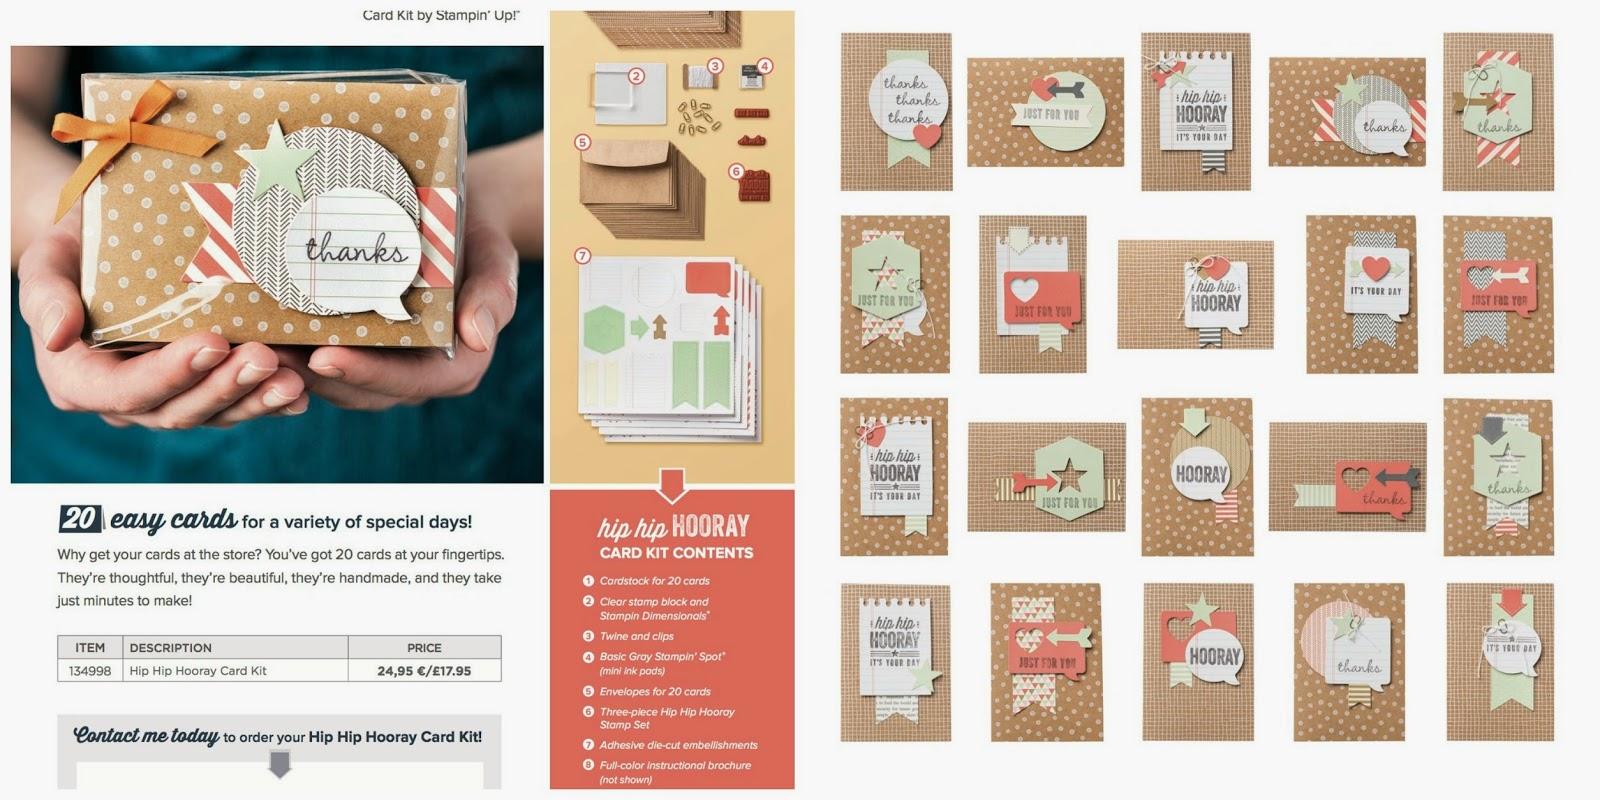 Stampin up card making ideas kit Tracy May